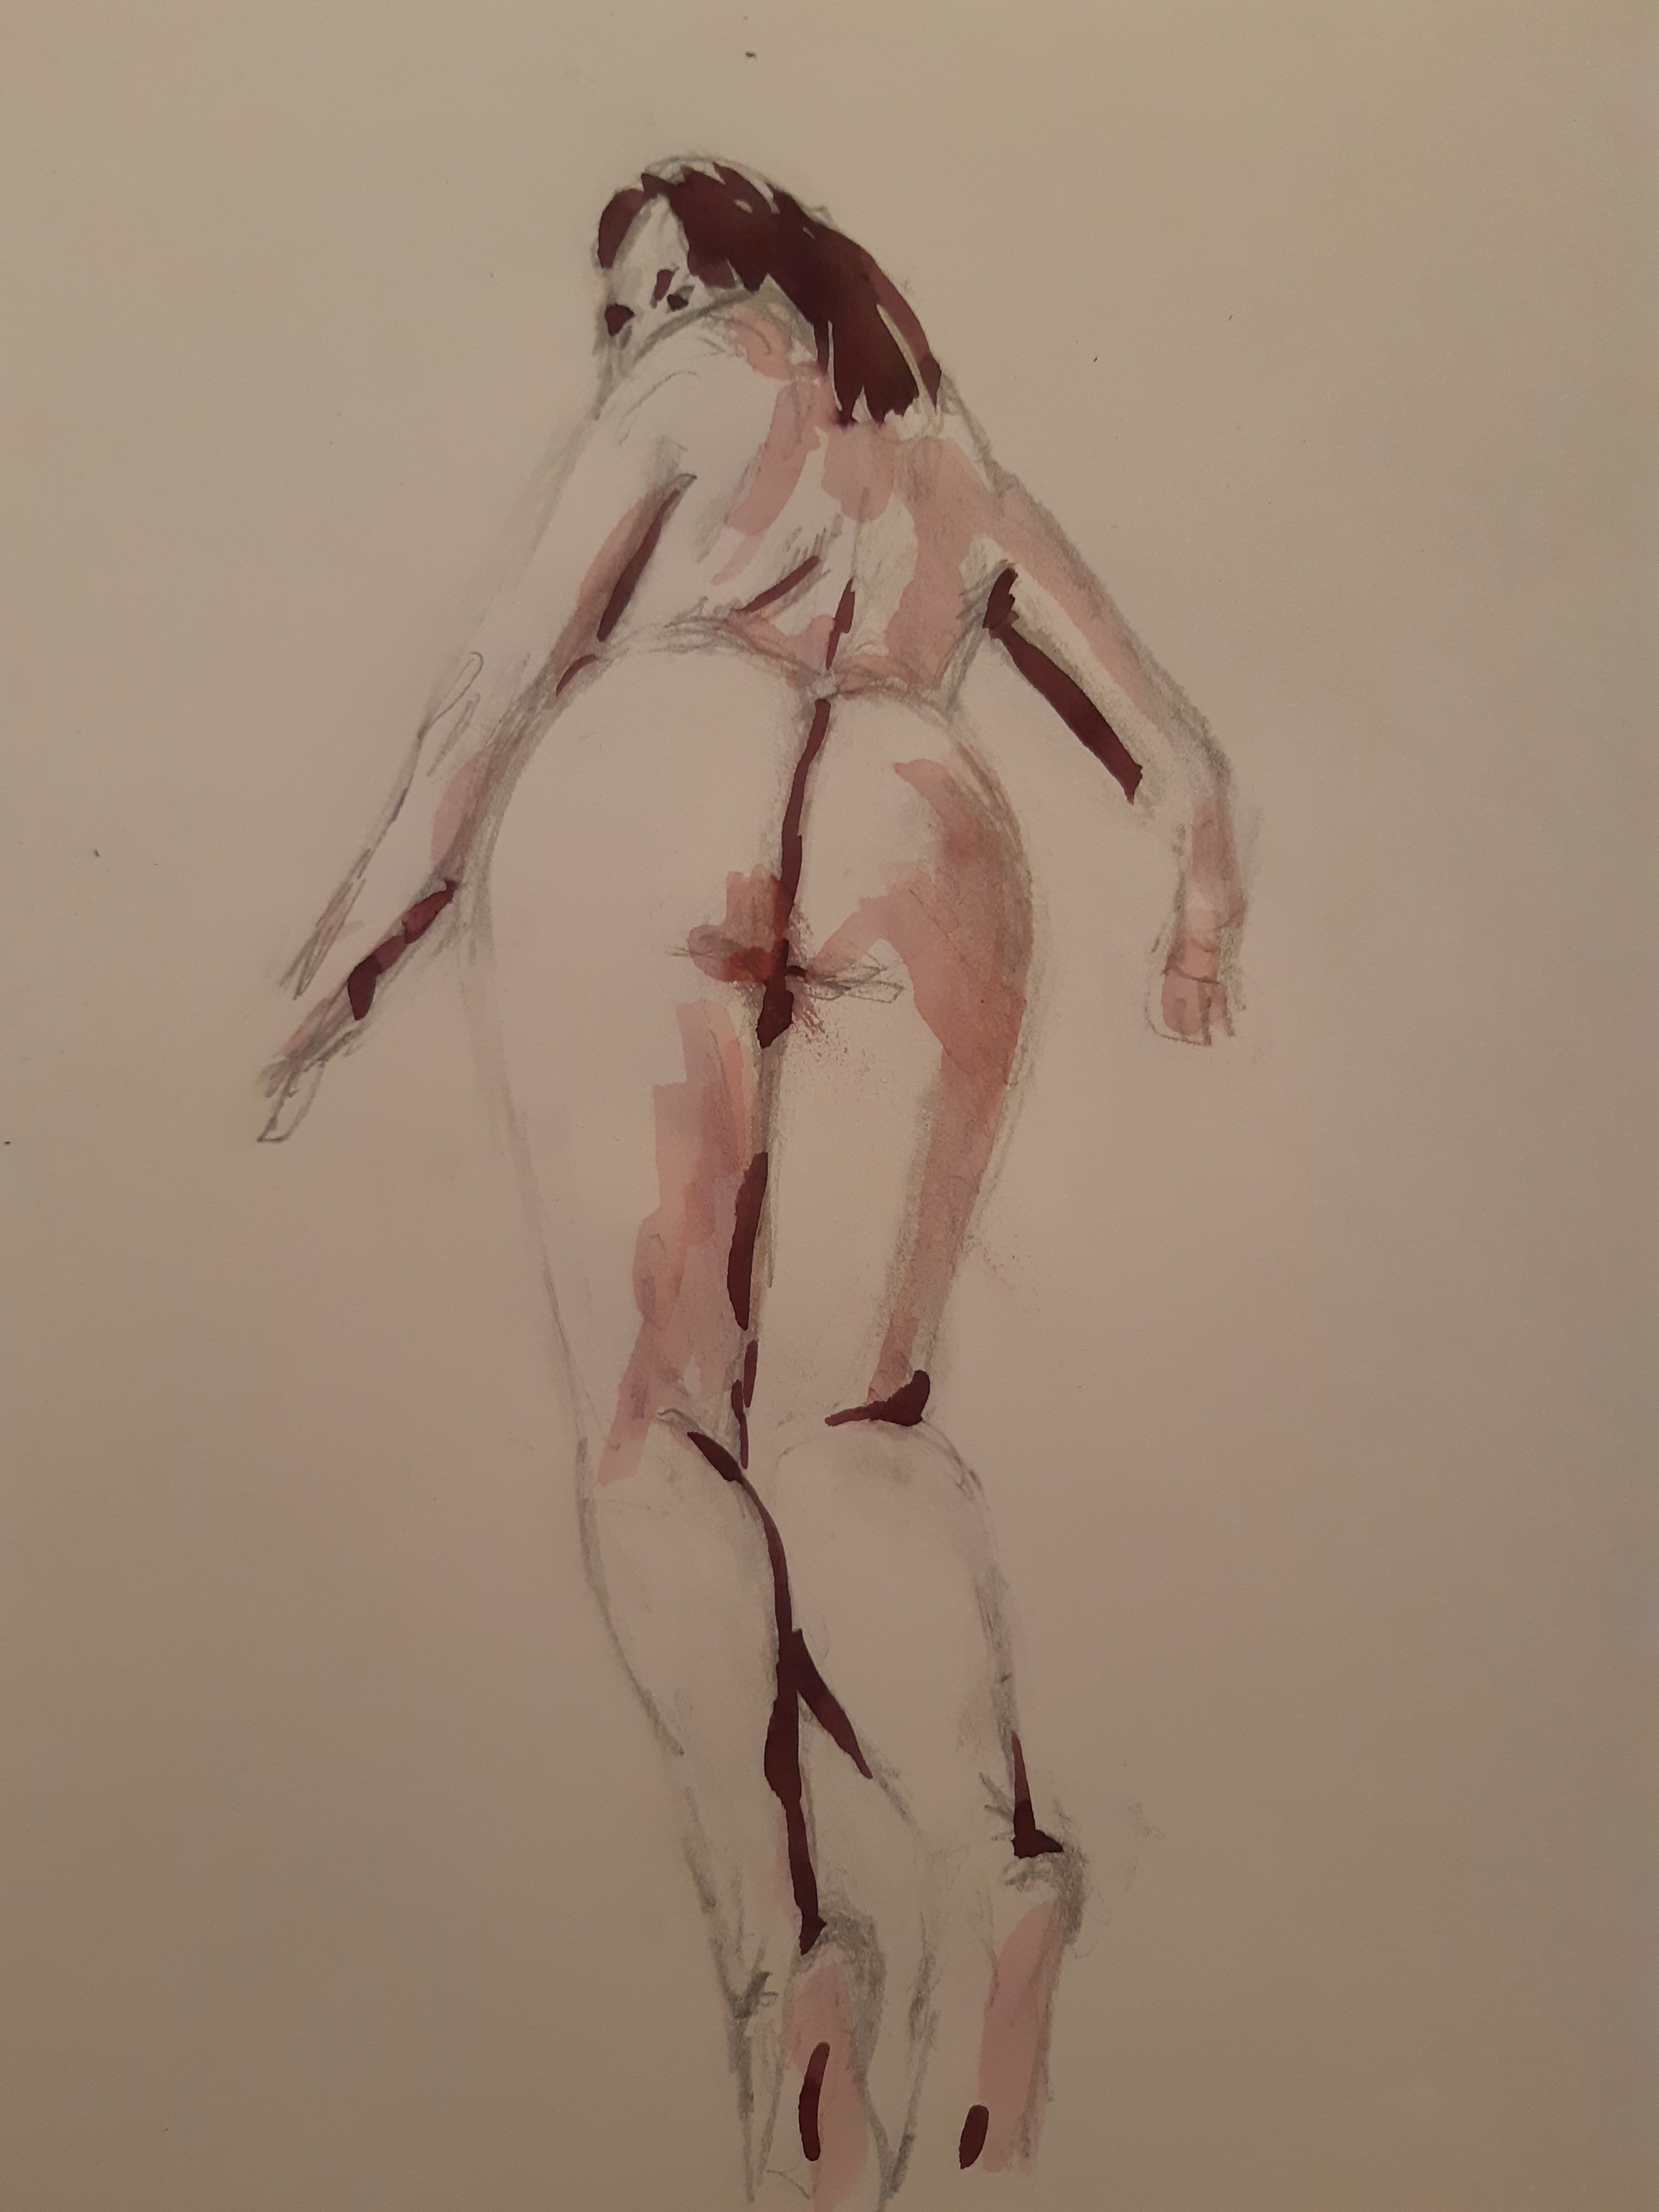 Aquarelles contre-plong�es mod�le dos femmes  cours de dessin